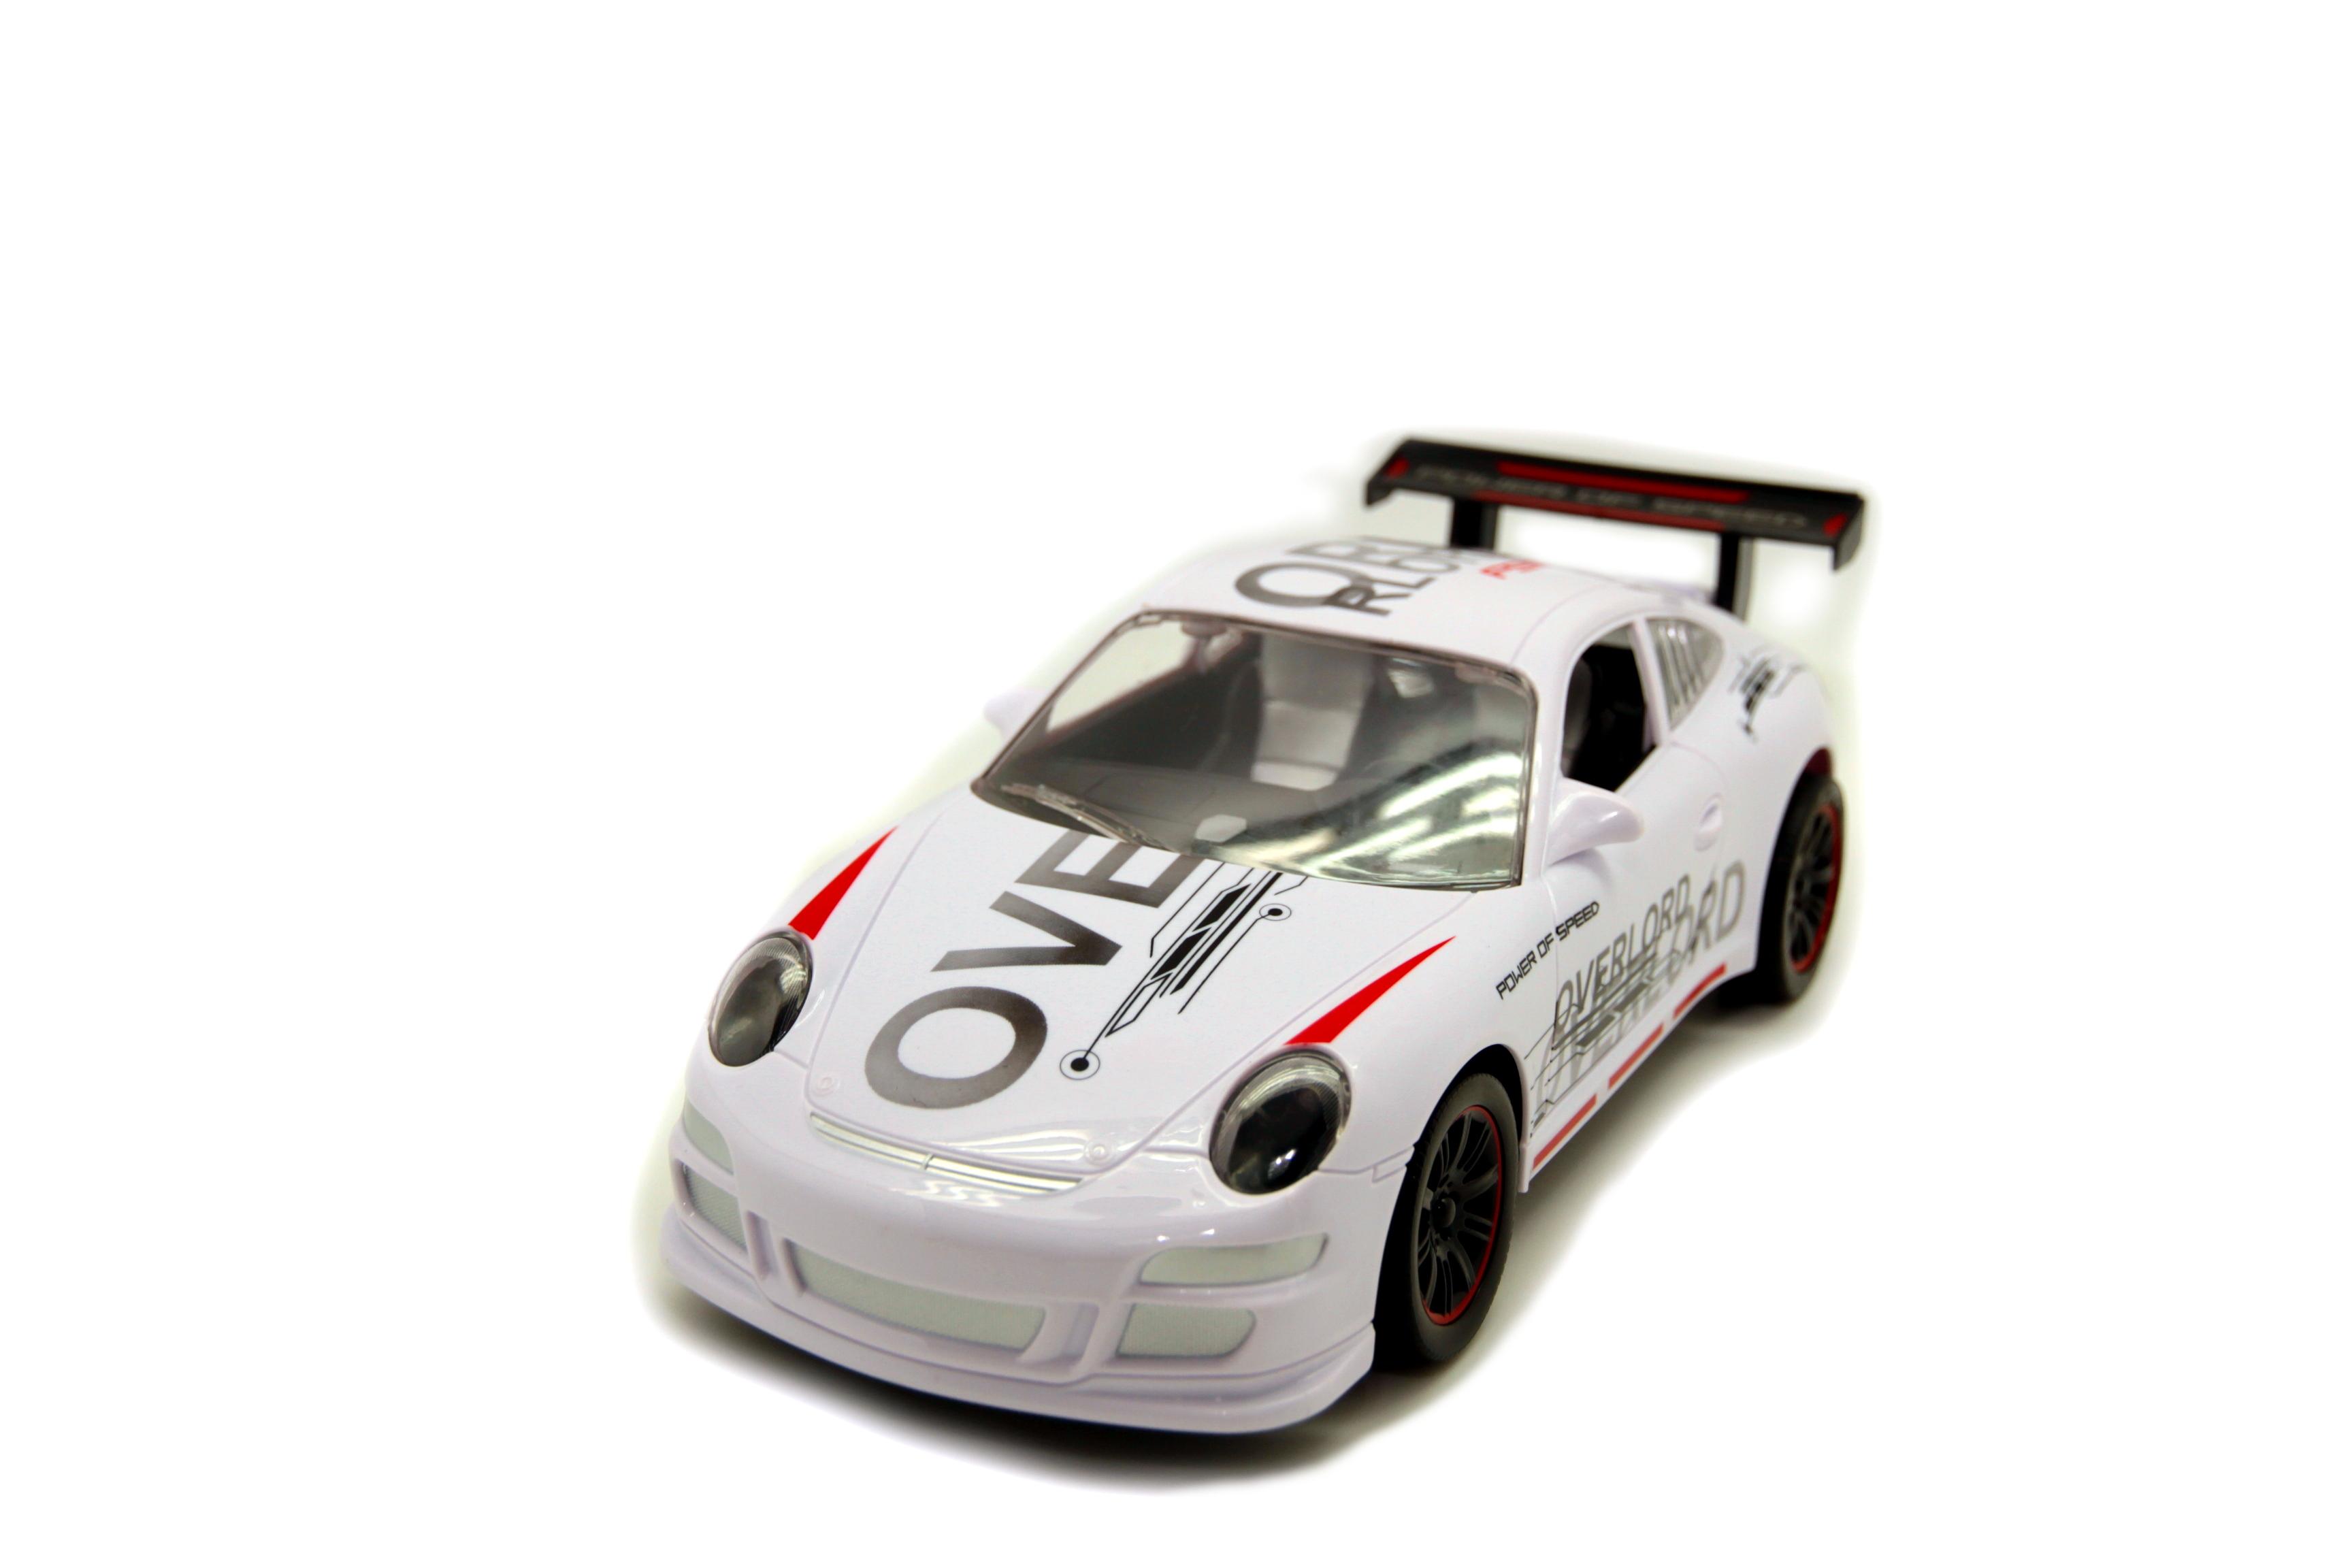 Машинки и мотоциклы BALBI Машина Balbi RCS-1601 WP 1:16 белая original hobbywing quicrun wp 16bl30 sensorless brushless 30a esc motor kv4500 program card for 1 16 1 18 car